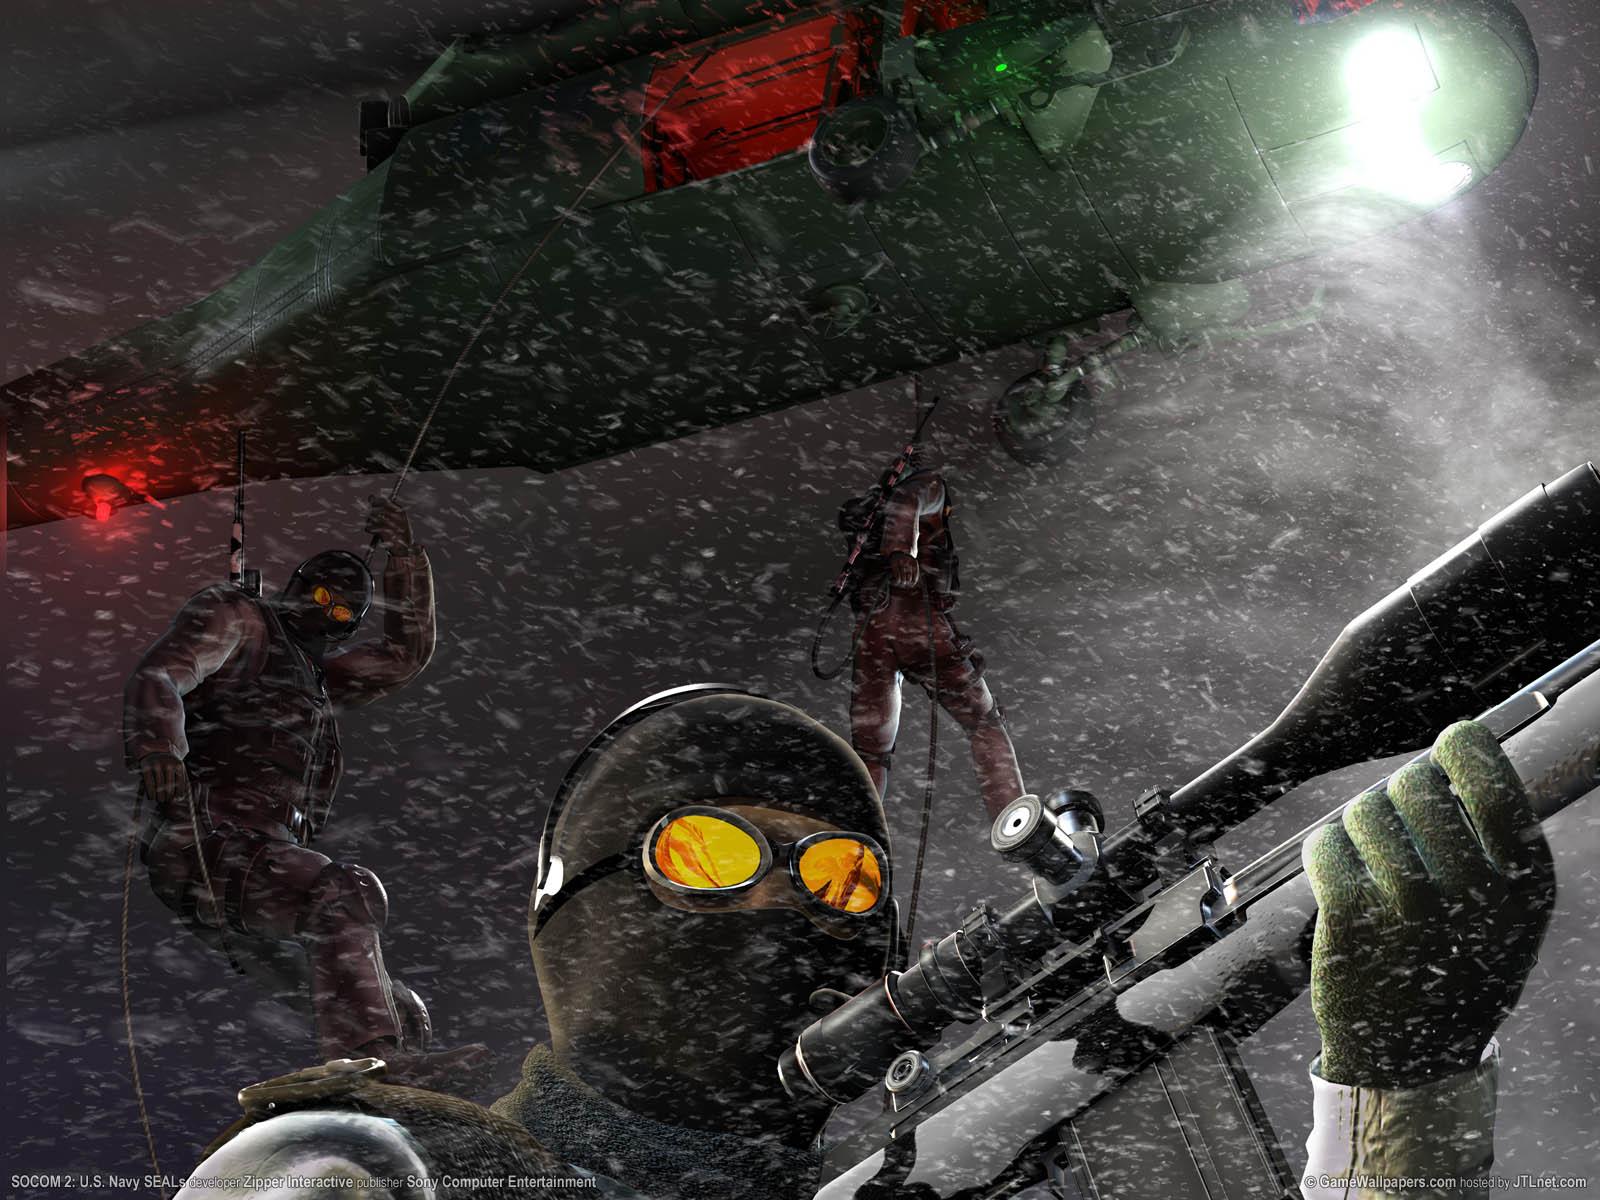 SOCOM 2: U.S. Navy SEALs Hintergrundbild 04 1600x1200